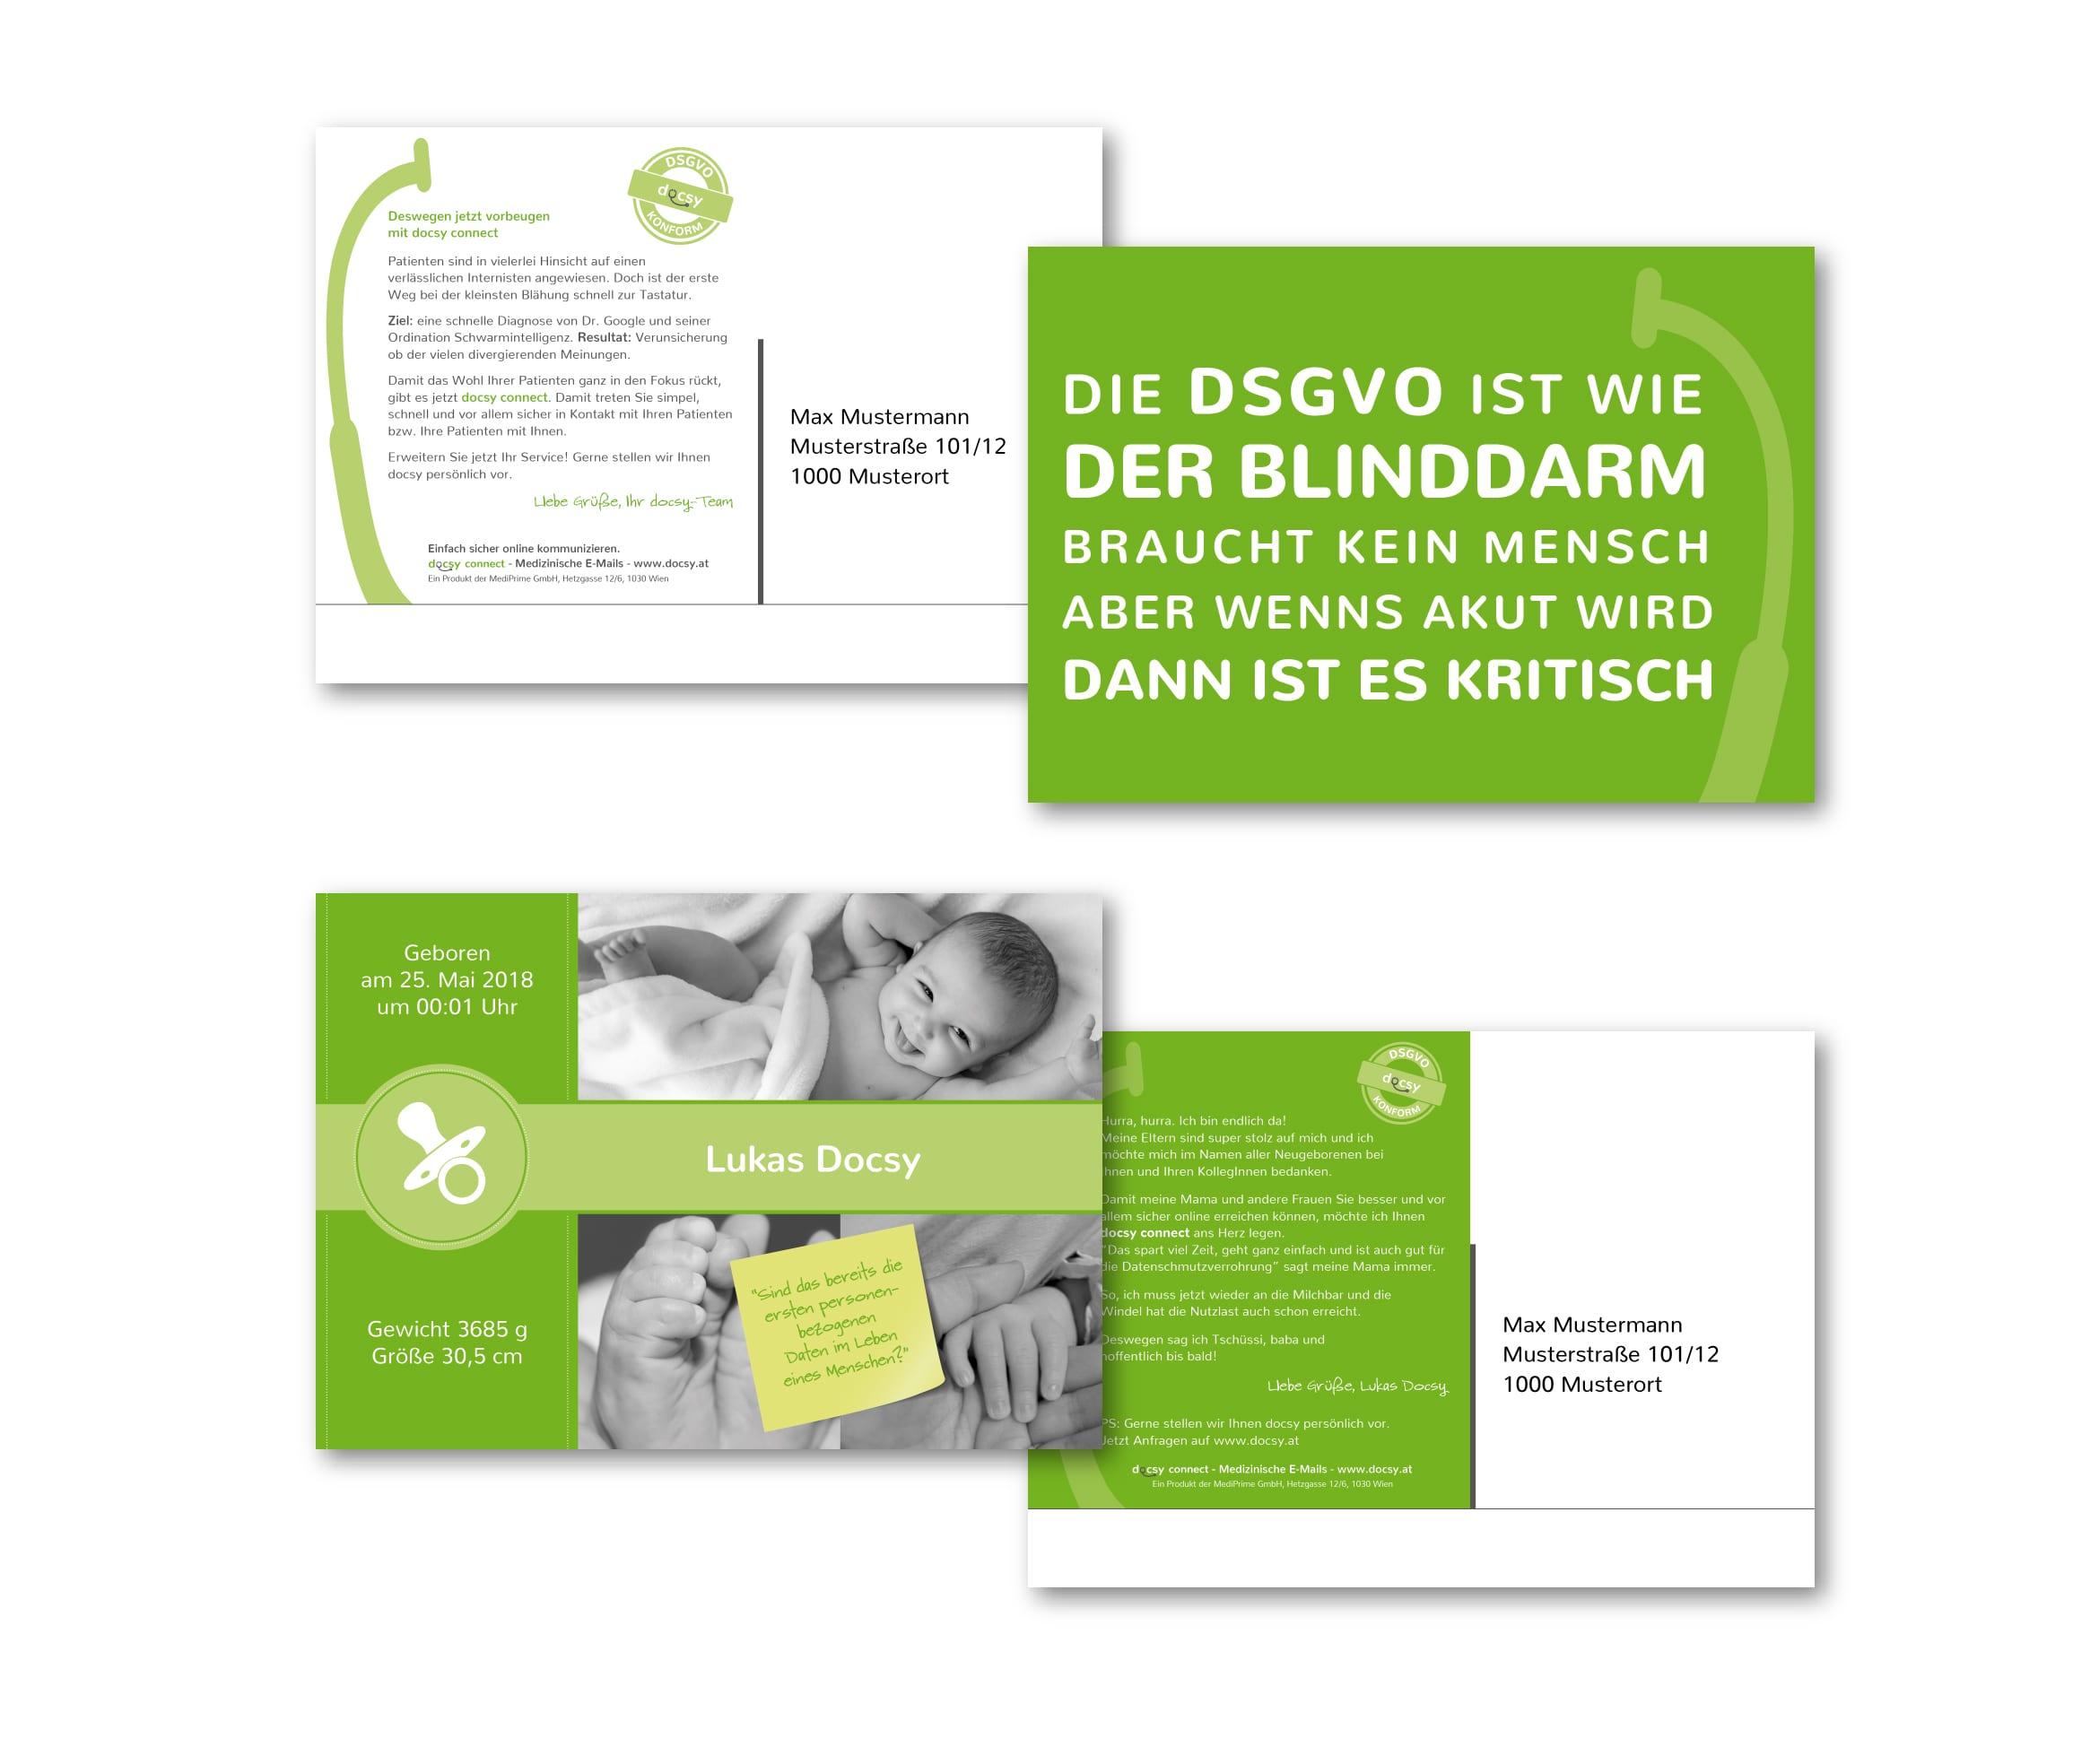 DSGVO Kampagne